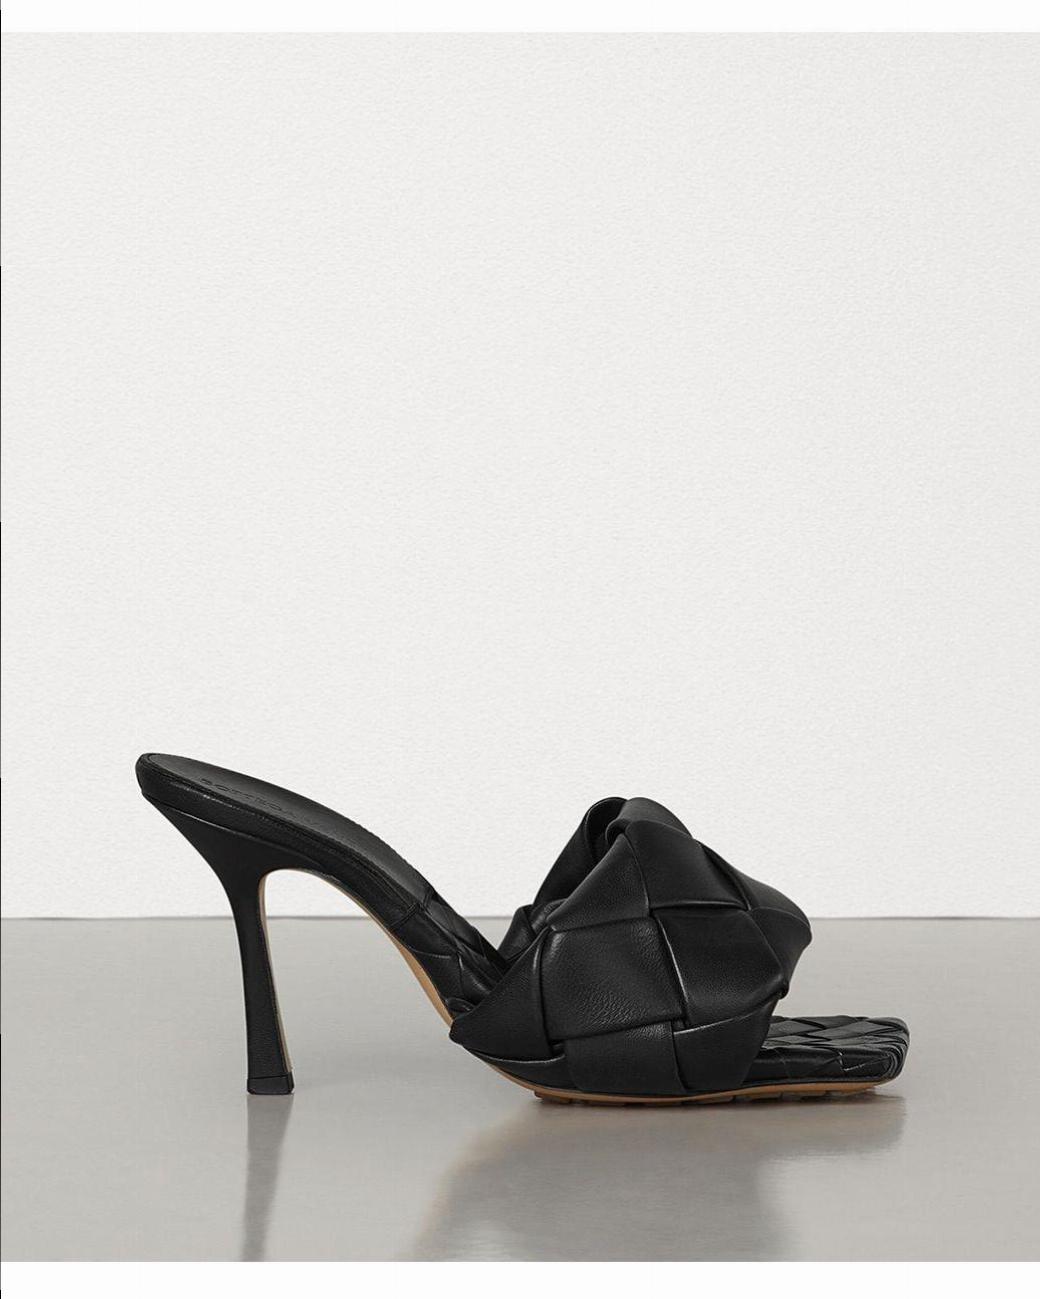 Bottega Veneta Lido Intrecciatowoven Leather Sandals New Season | HEWI London